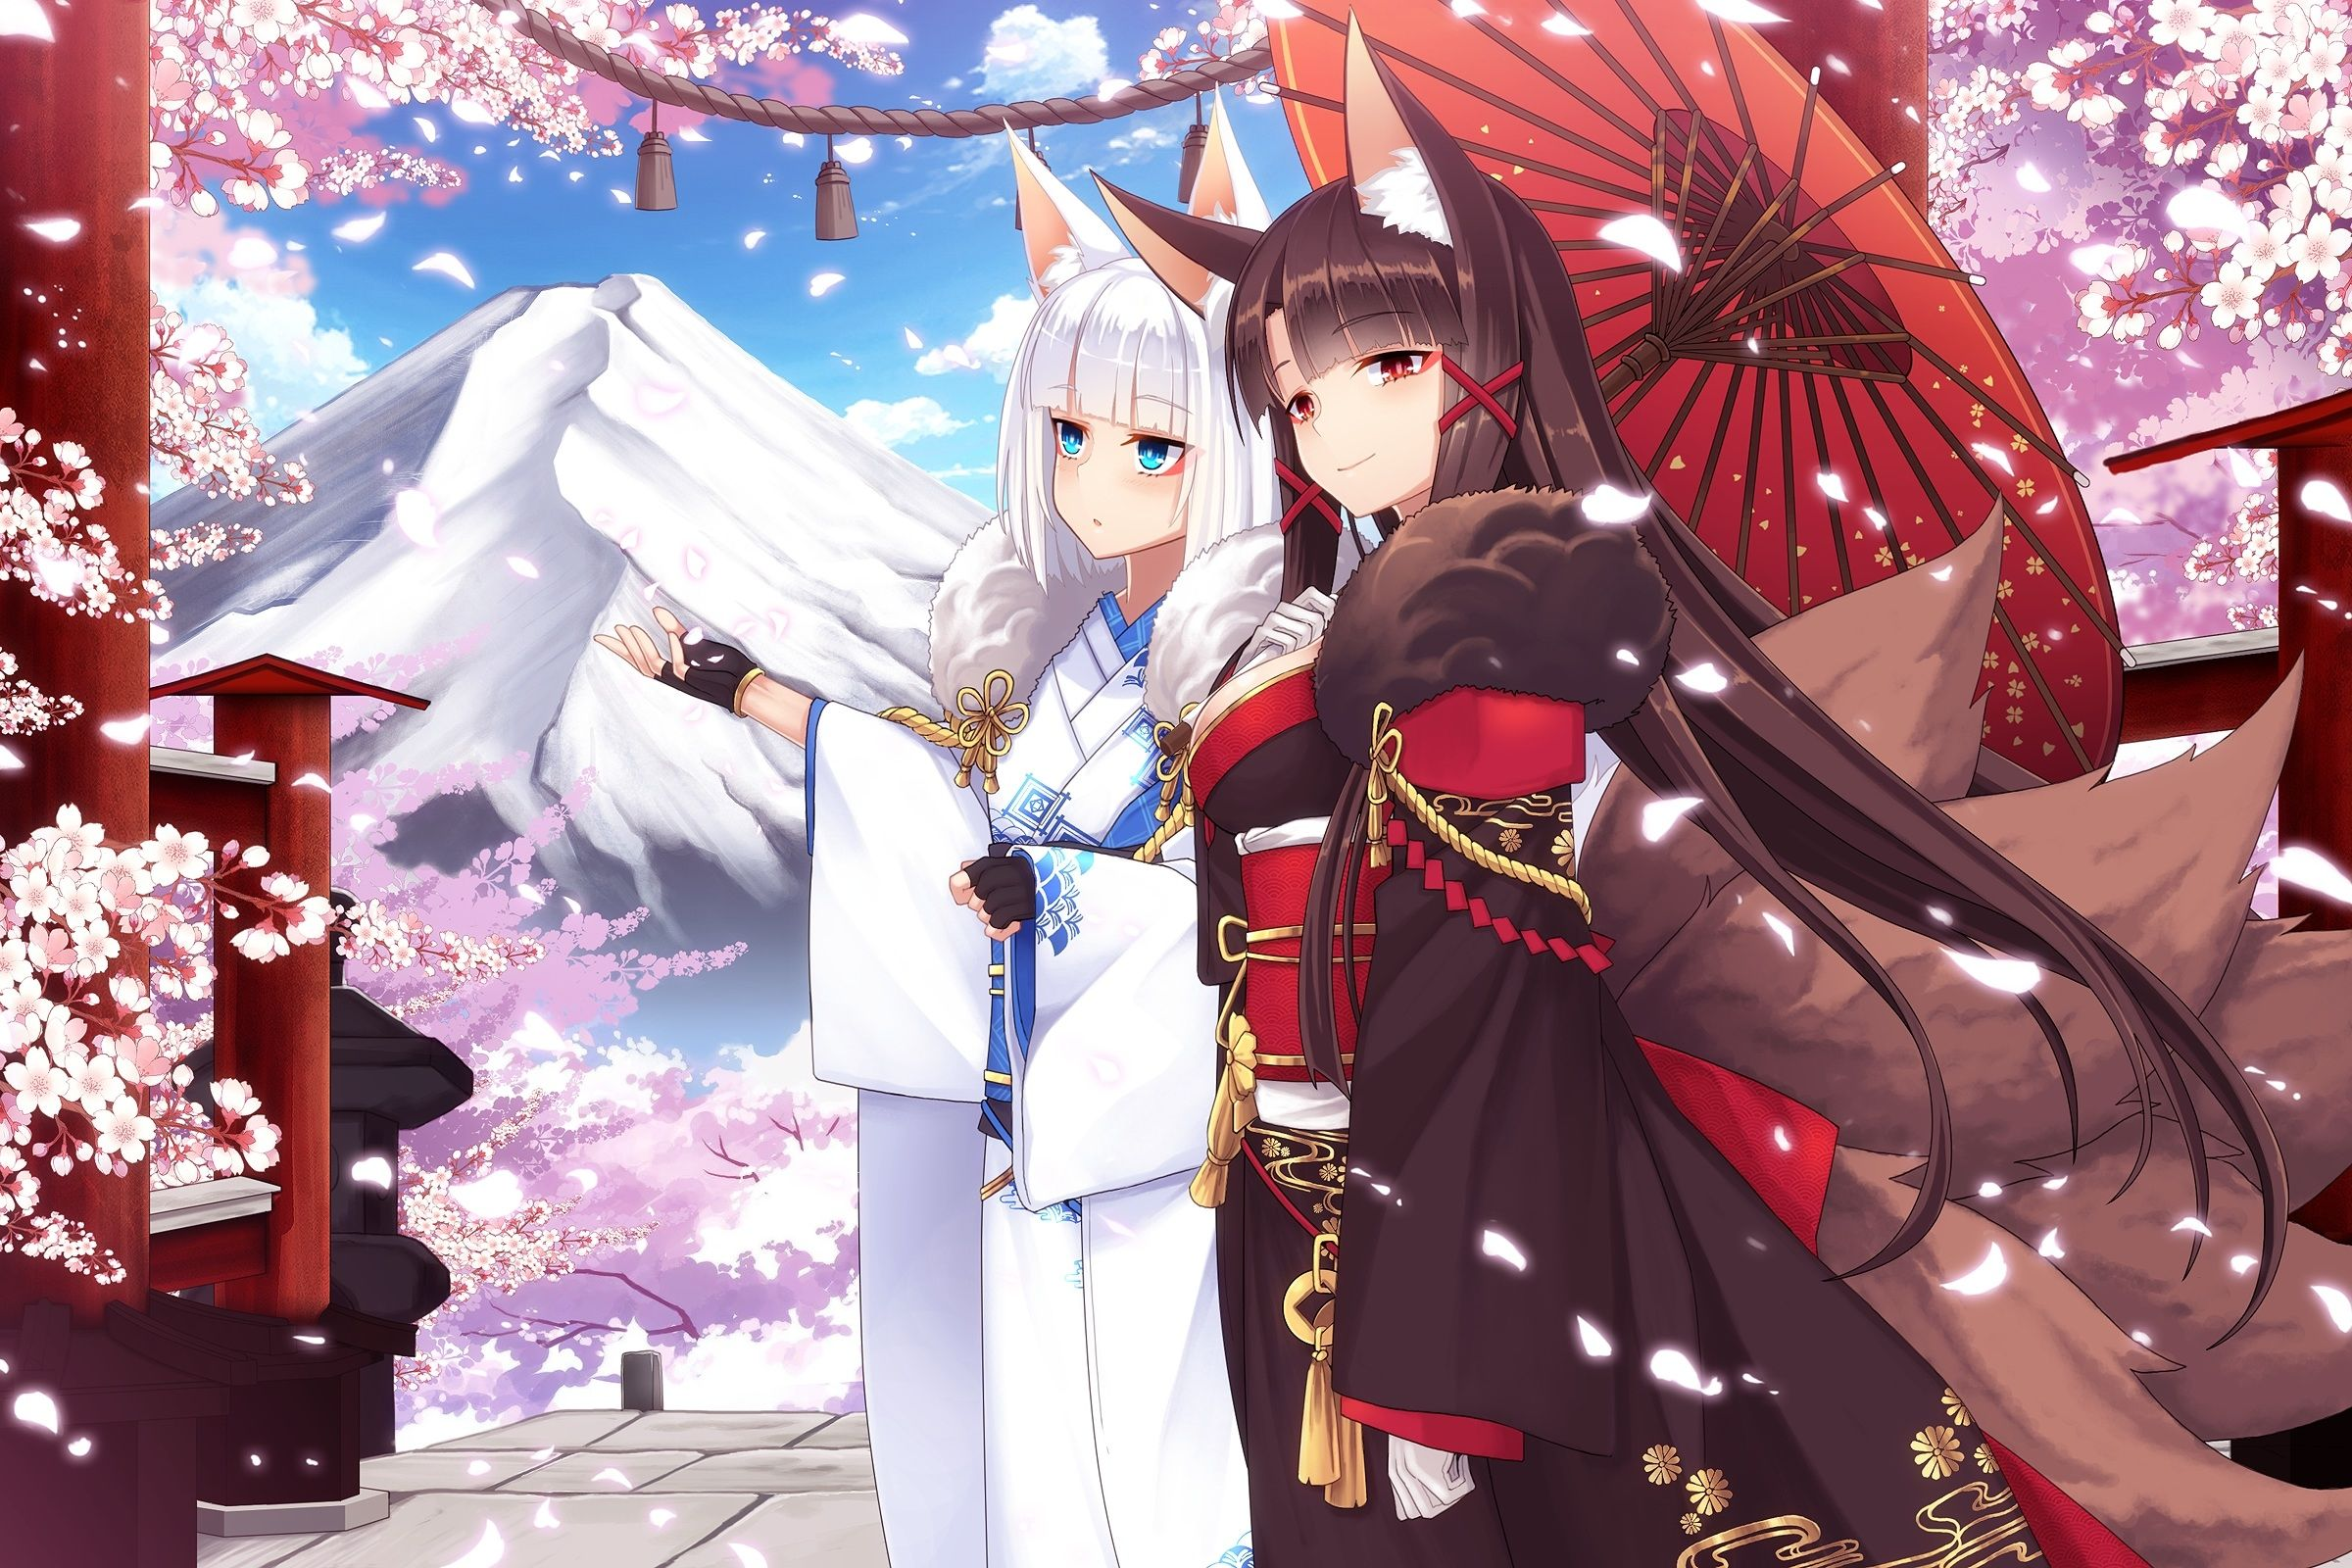 Download 2400x1600 Azur Lane Akagi Kaga Kimono Animal Ears Sakura Blossom Wallpapers Wallpapermaiden Anime Kaga Akagi Akagi muse azur lane wallpaper